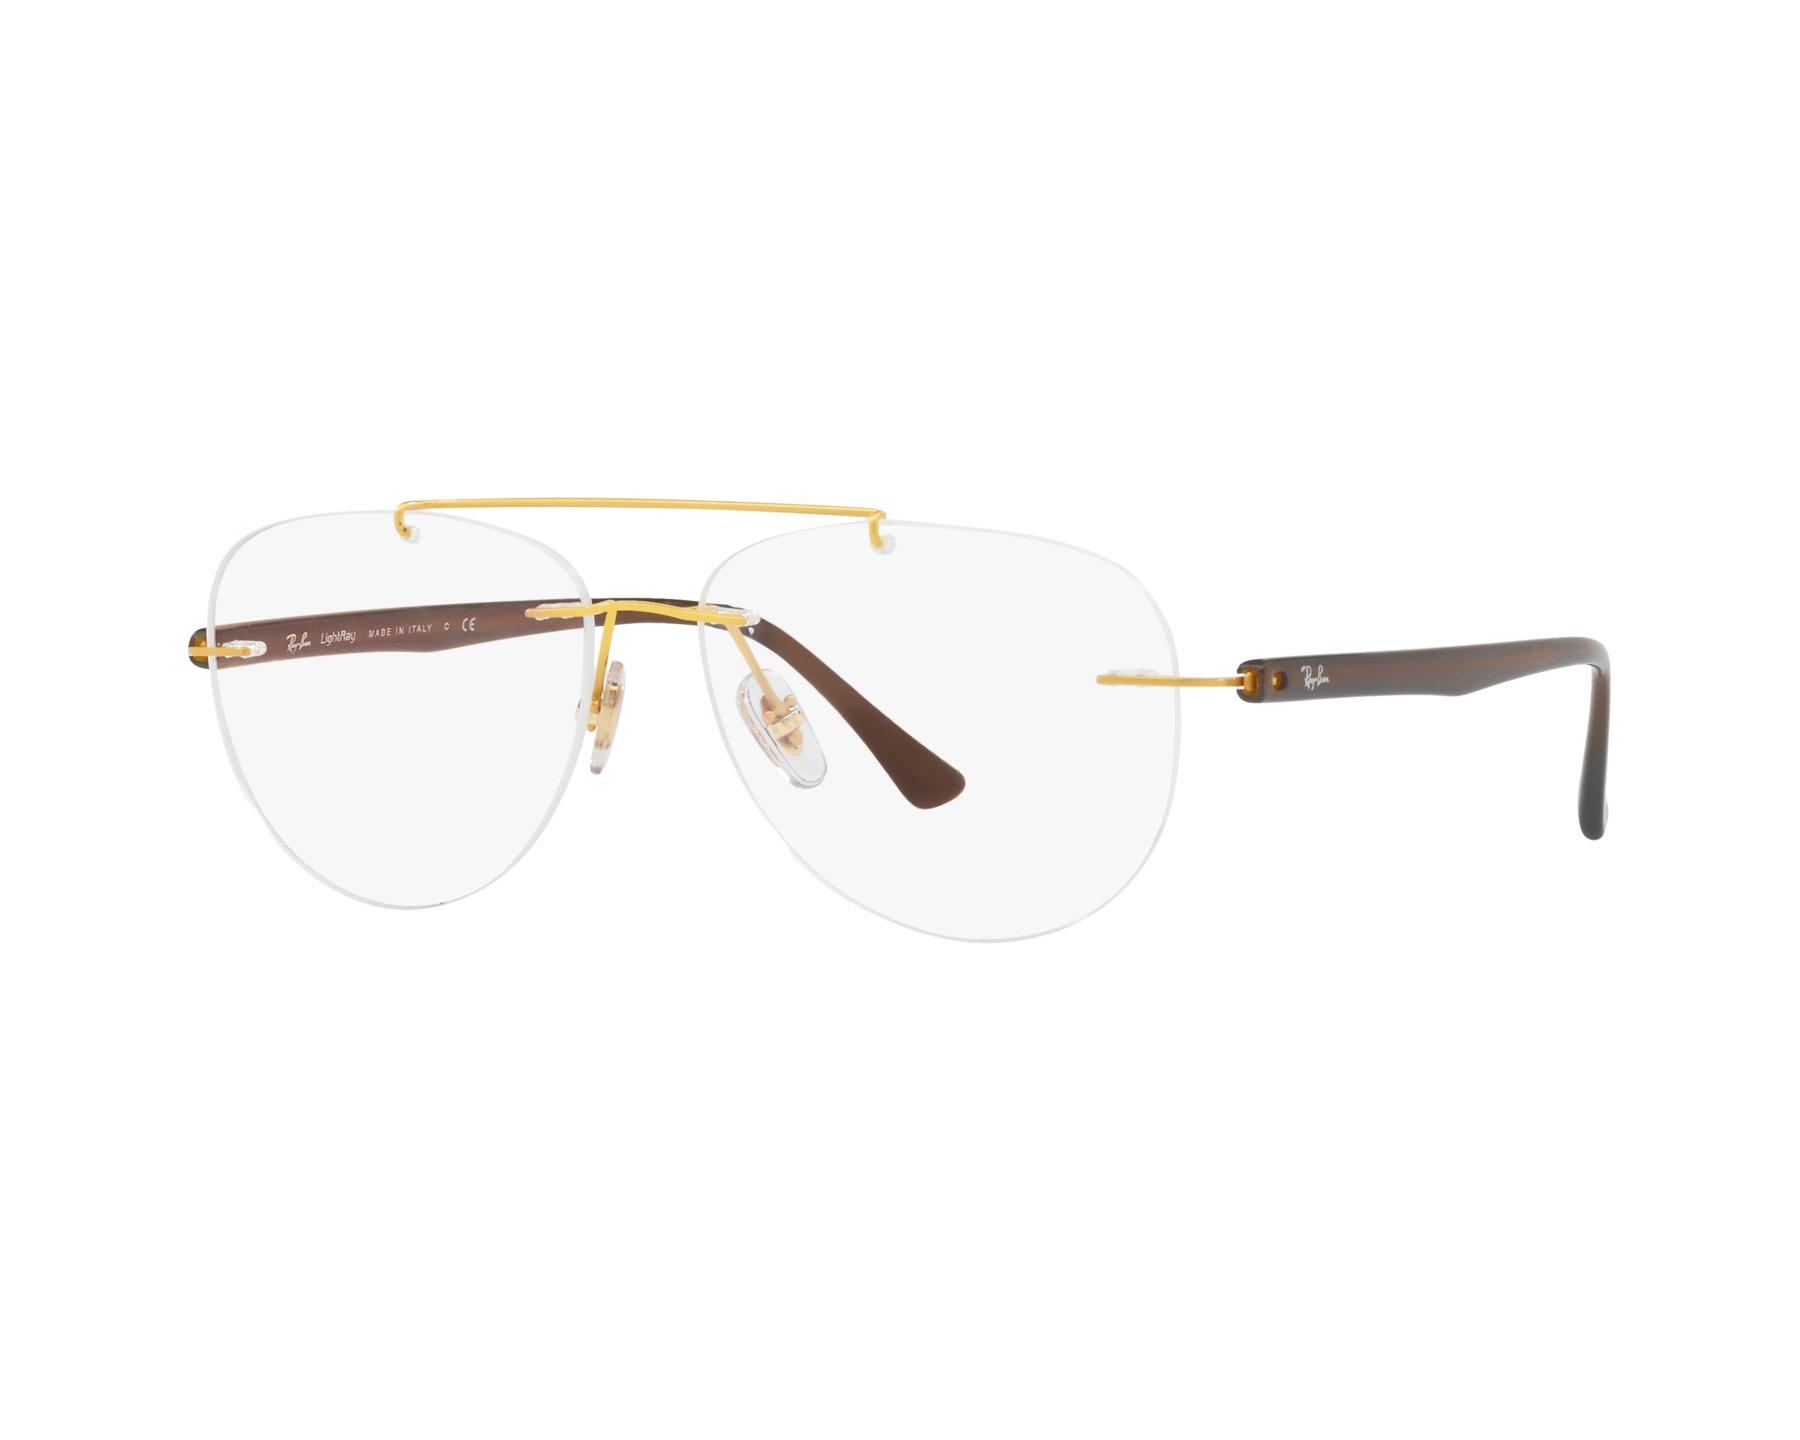 03cb4efc89 eyeglasses Ray-Ban RX-8749 1194 - Gold Brown